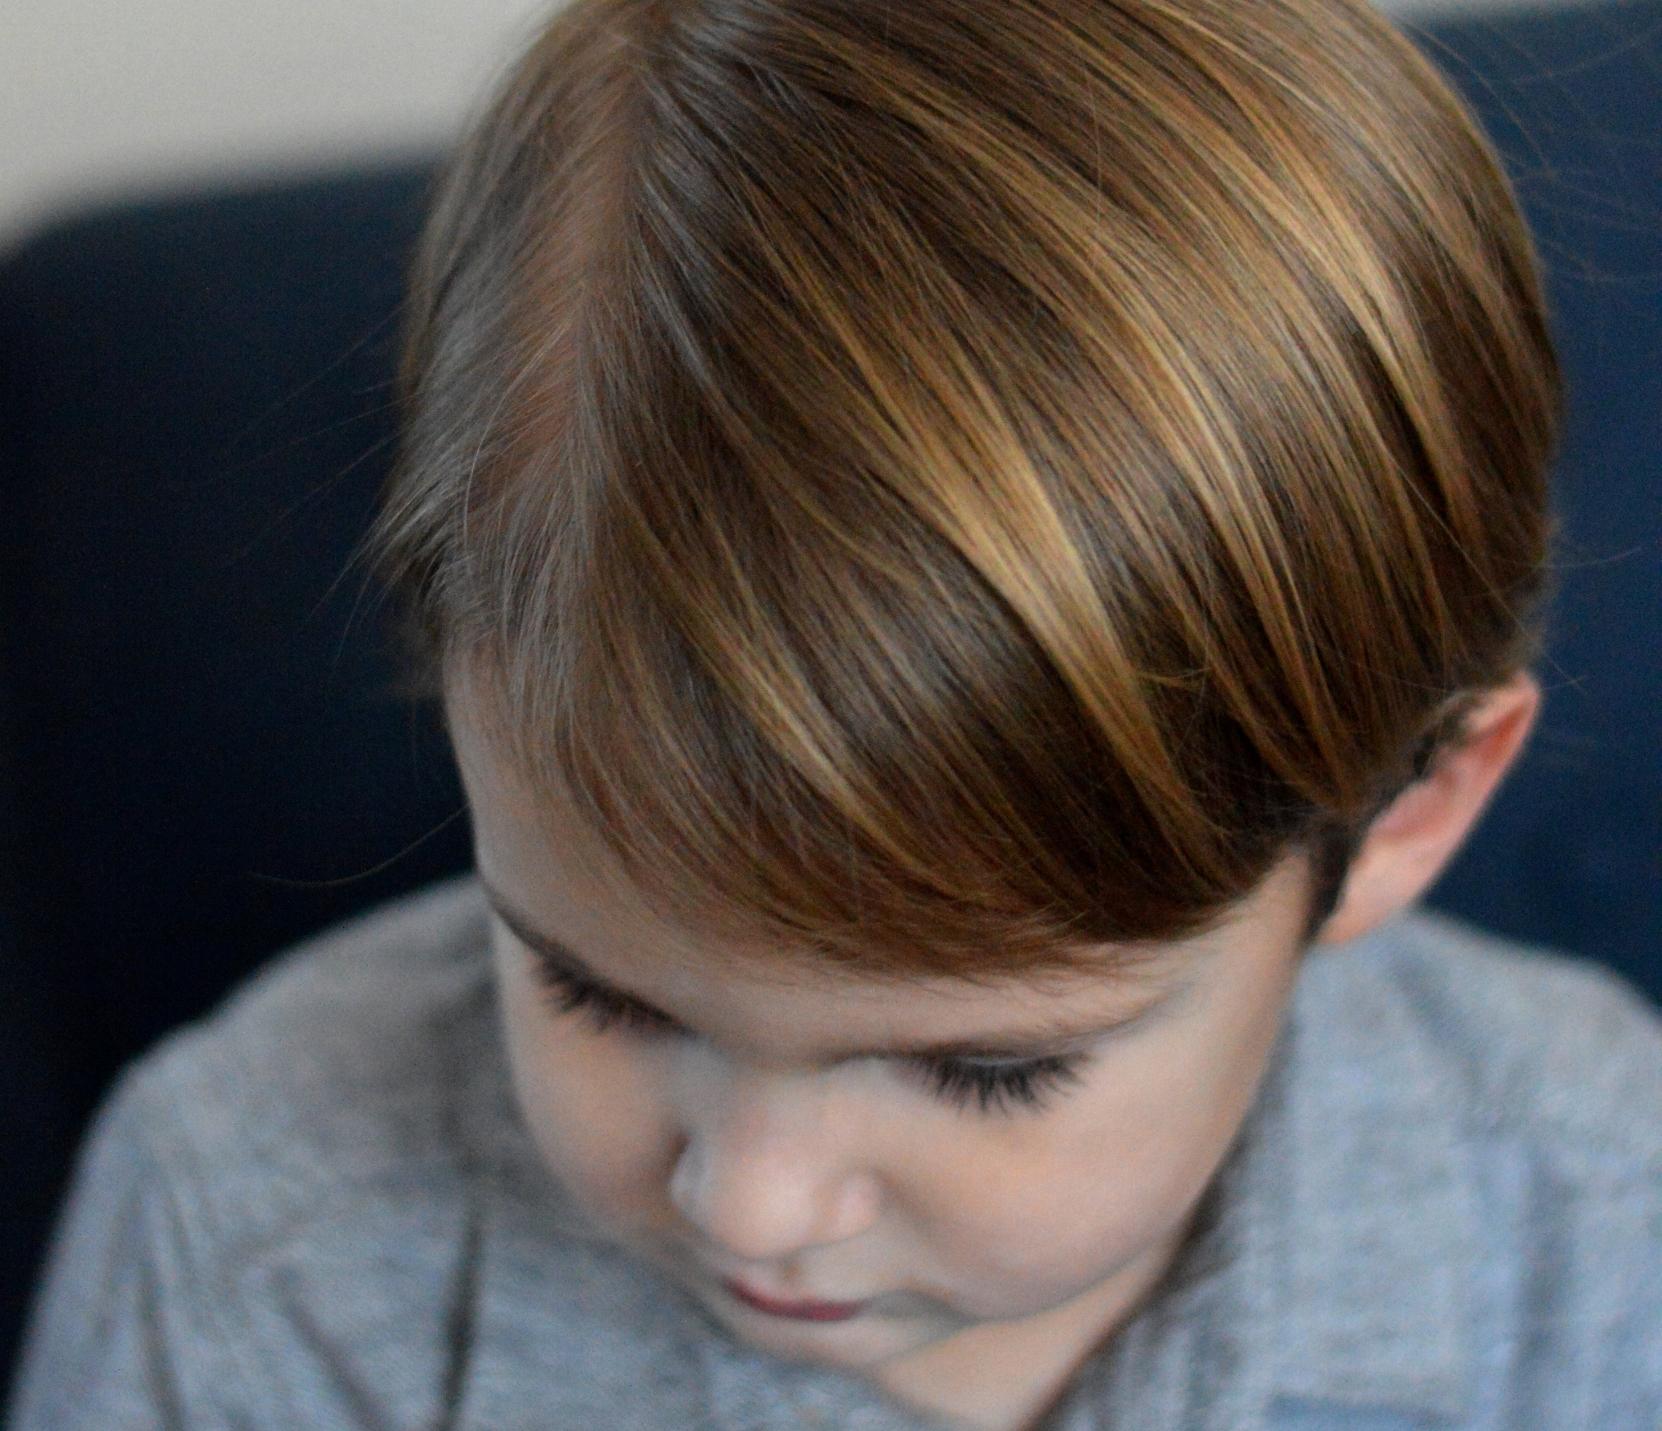 DIY boys hair cut in your kitchen